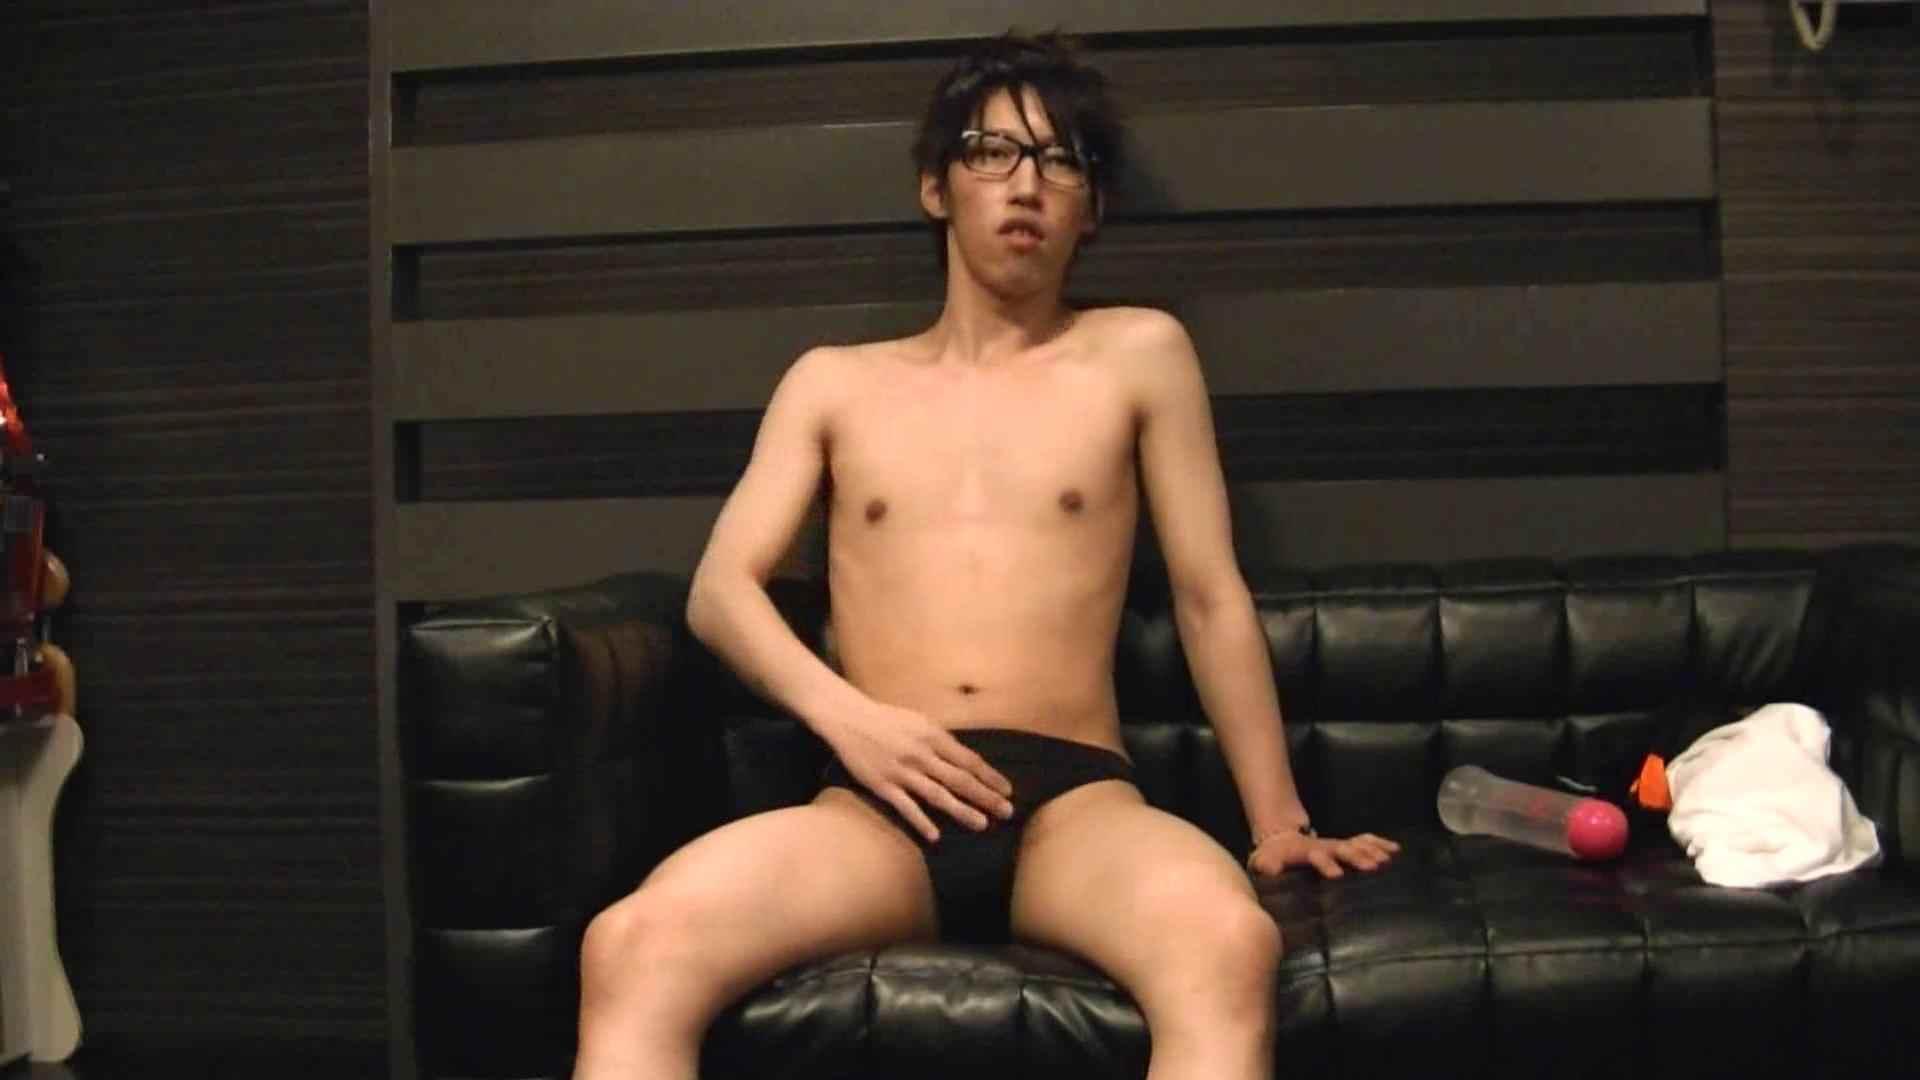 ONA見せカーニバル!! Vol3 男 ゲイ無料無修正画像 89枚 2